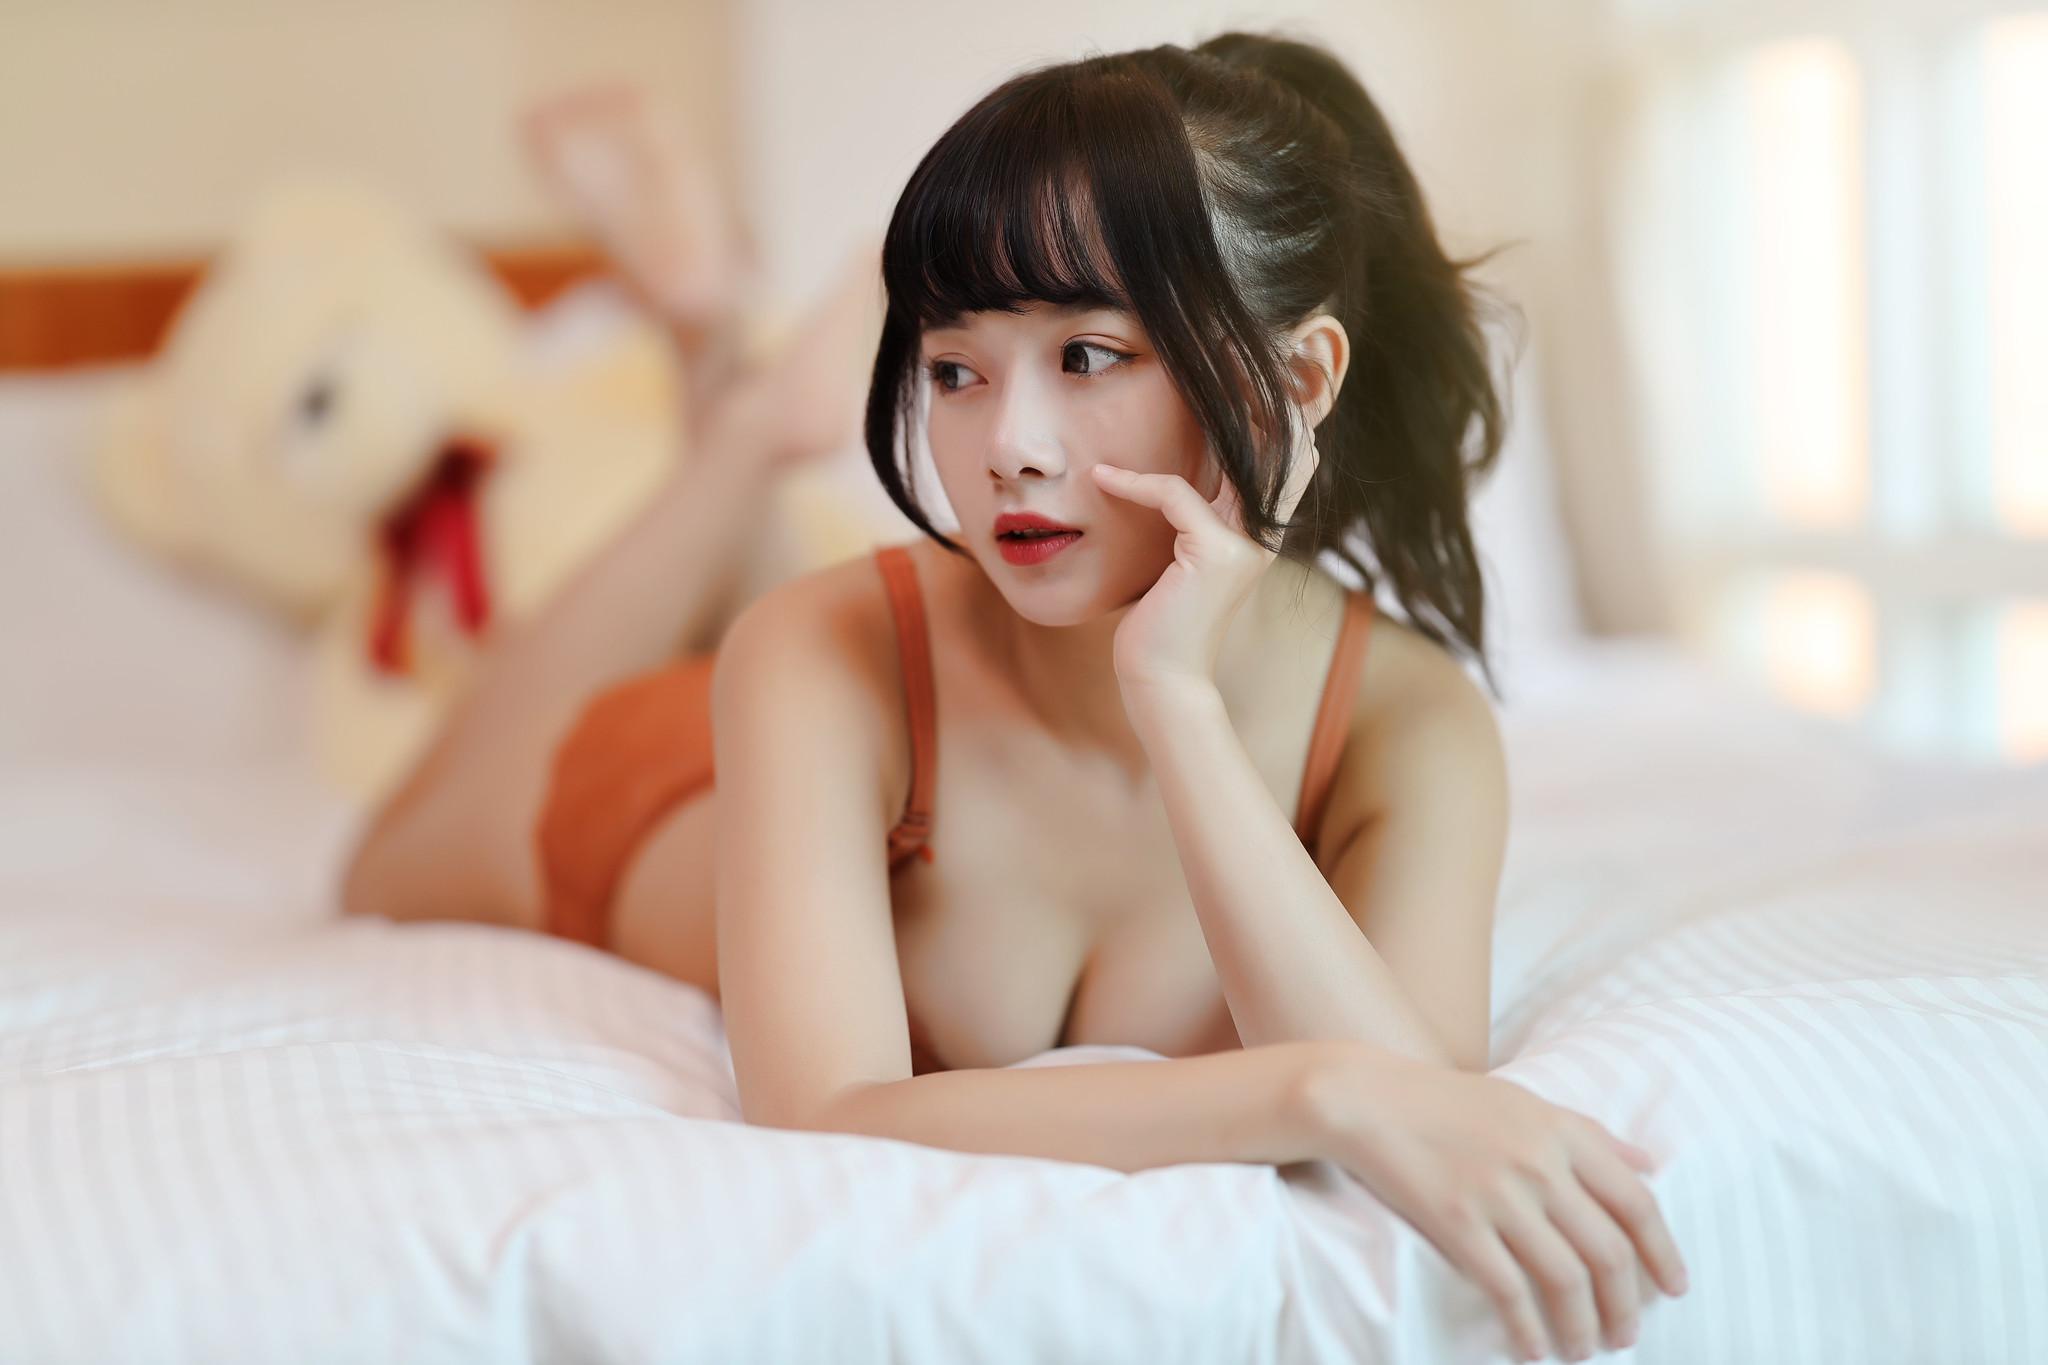 People 2048x1365 Winnie Qian women model Asian looking away bangs ponytail lingerie bra underwear panties lying on front touching face red lipstick in bed bed bokeh portrait indoors women indoors petite